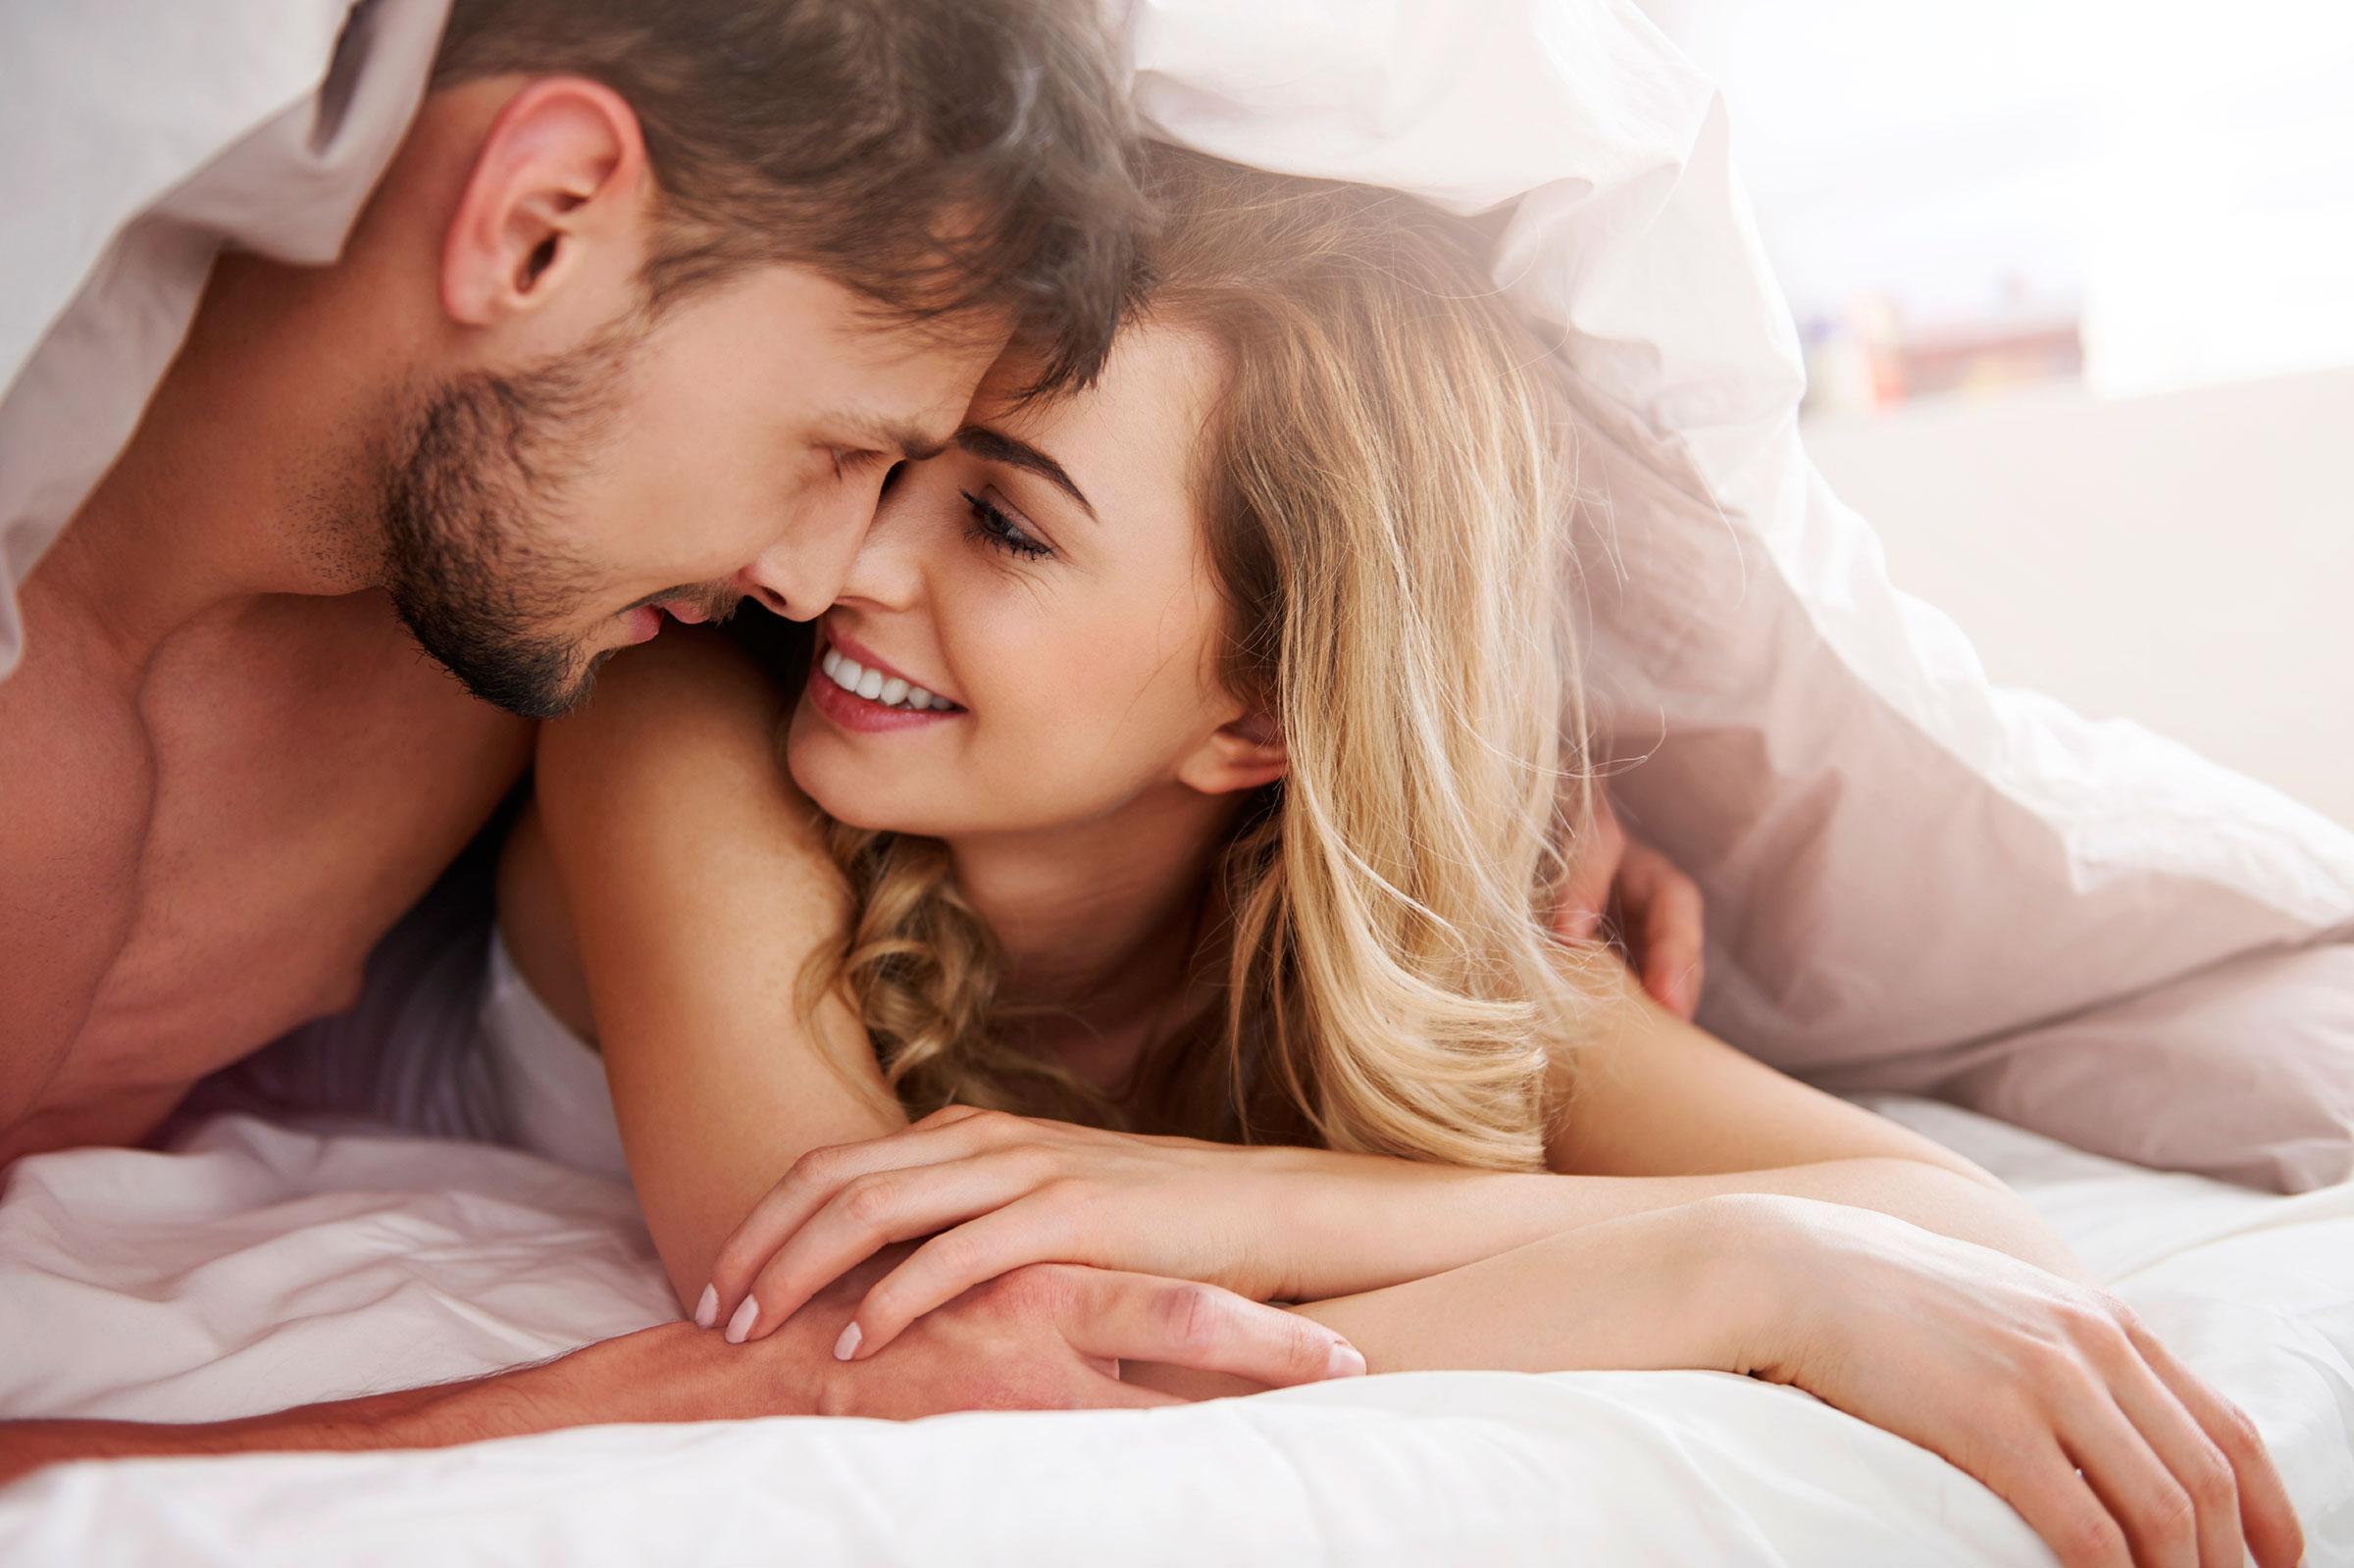 young-amateur-couple-making-love-wild-sex-cum-penetration-gifs